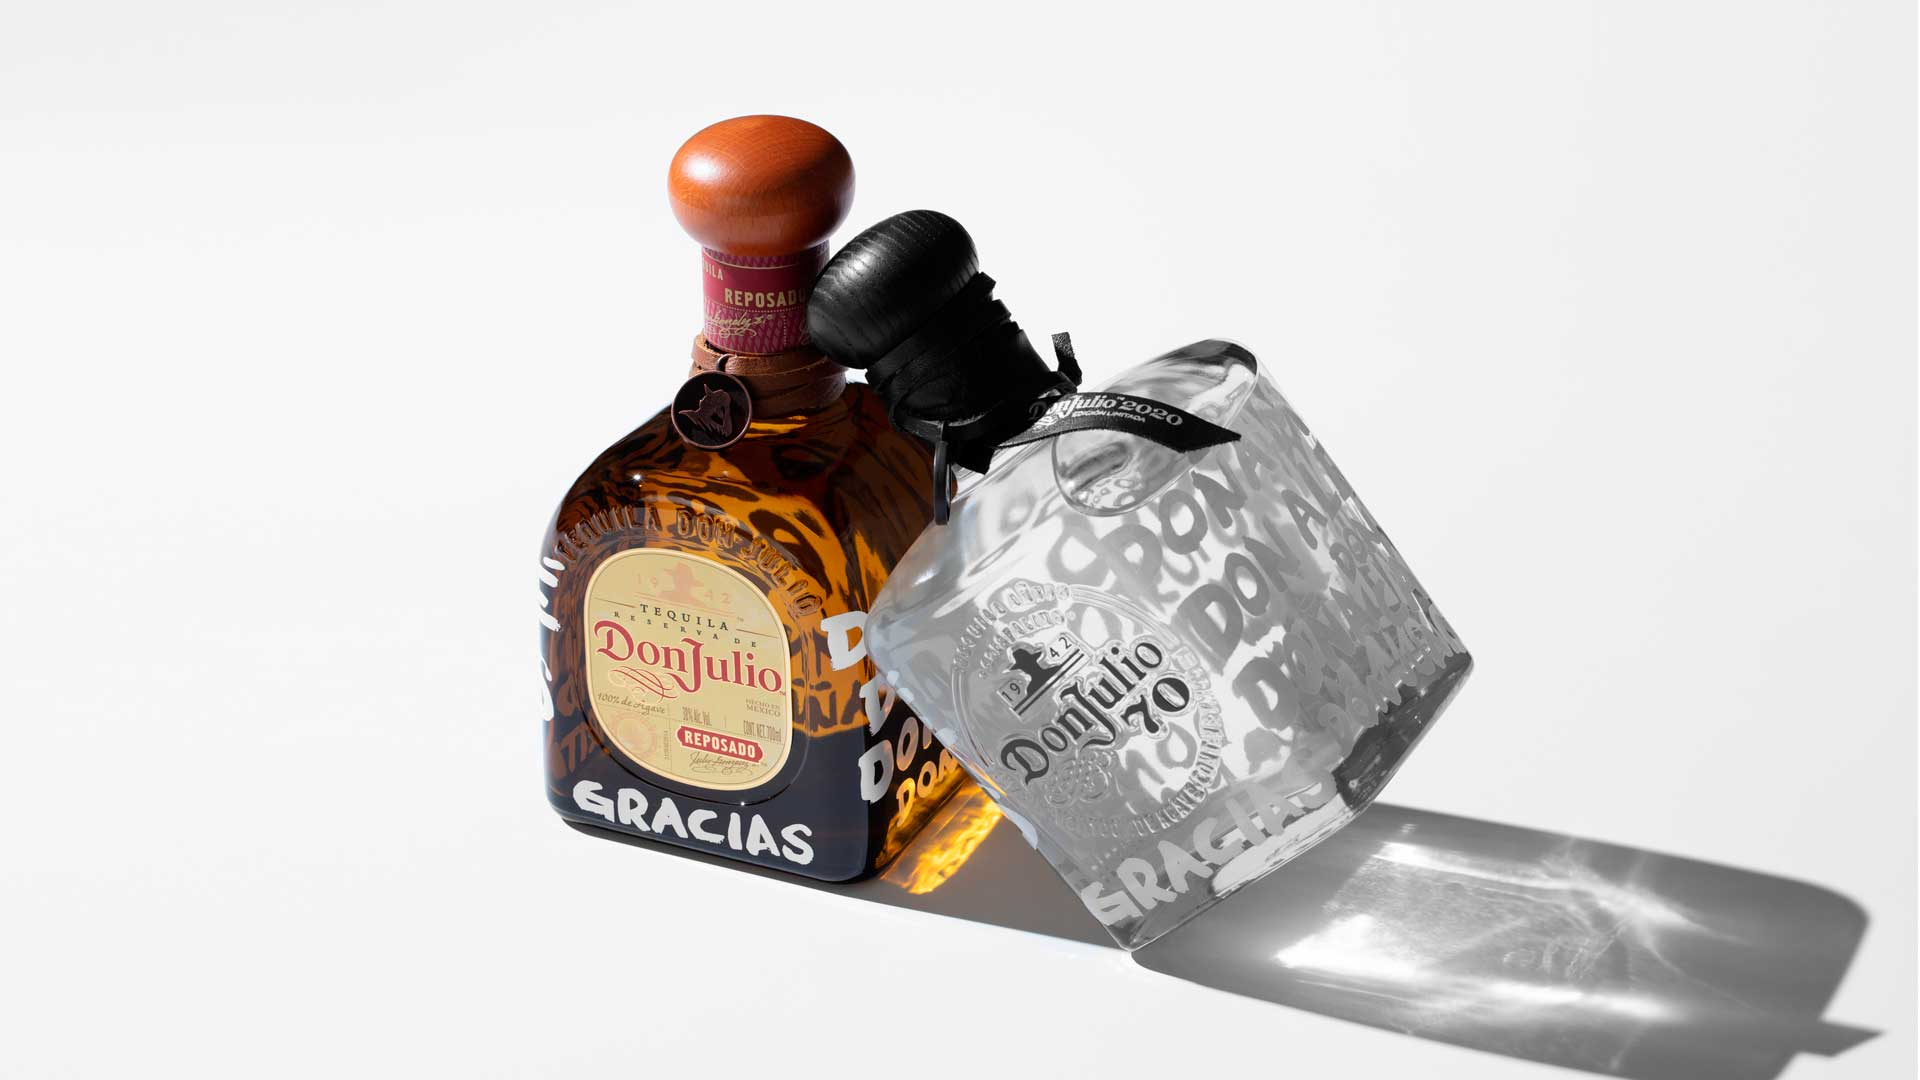 Tequila Don Julio se quita el sombrero ante laresiliencia